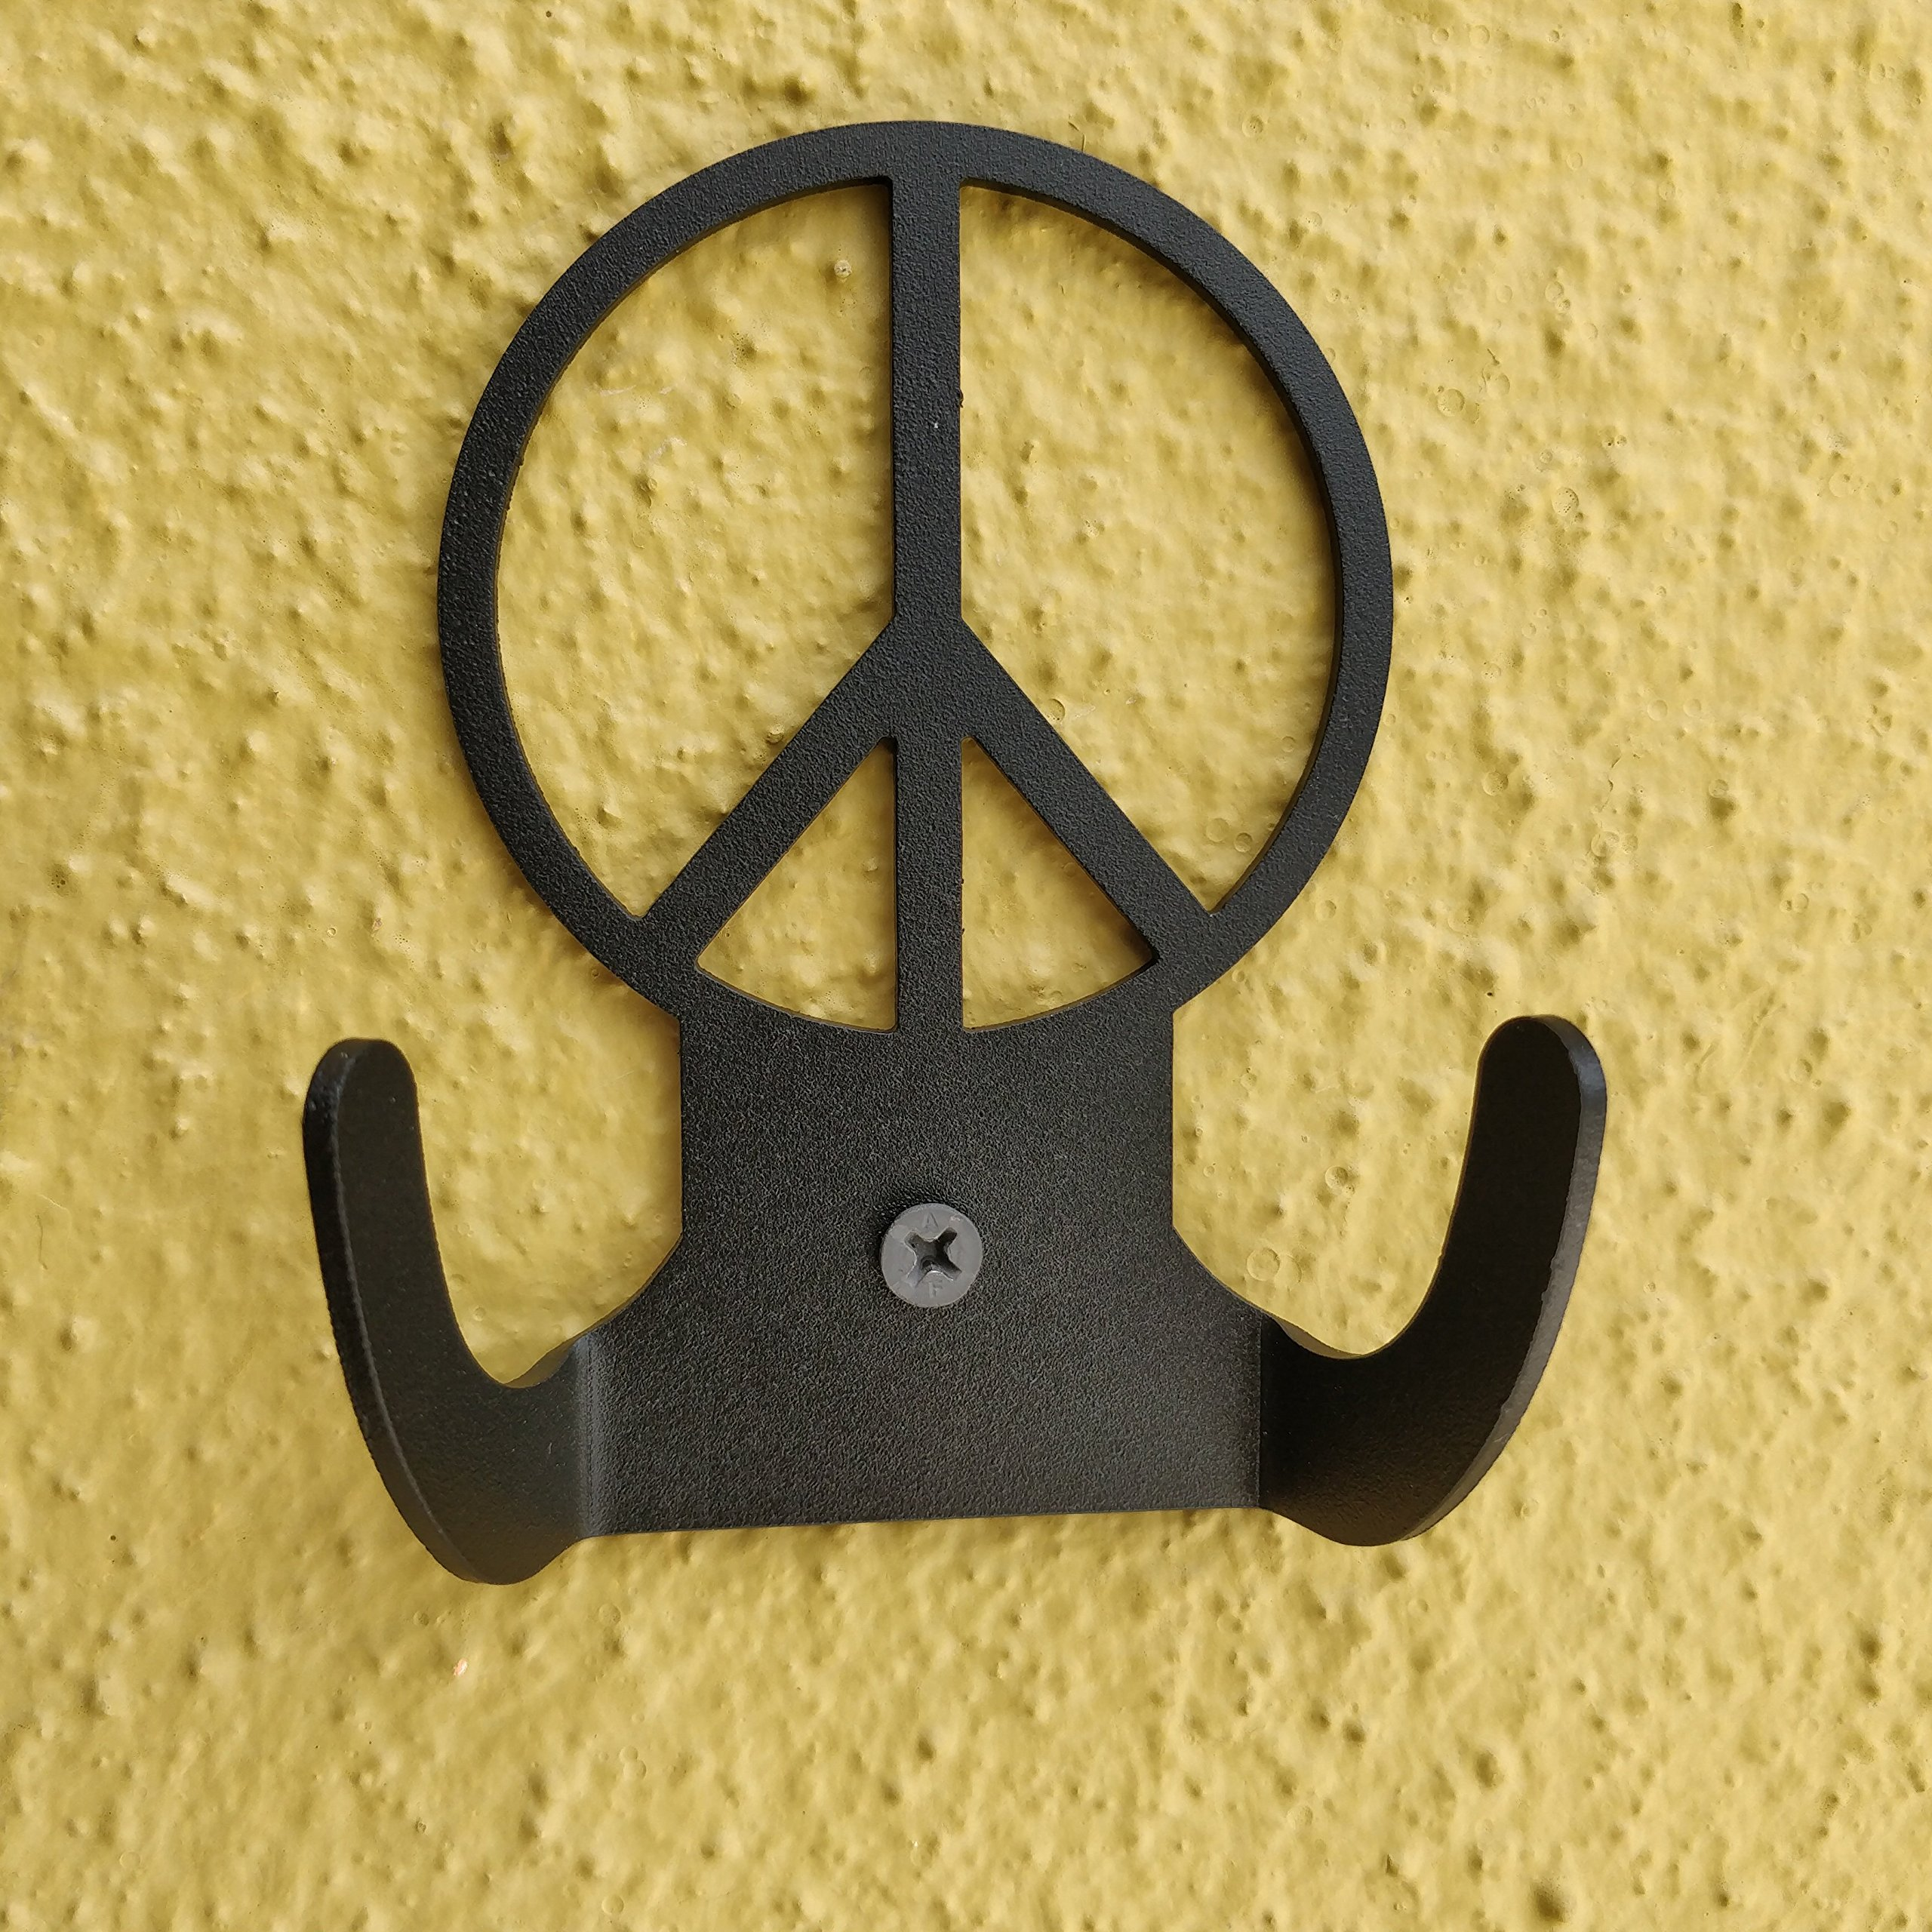 HeavenlyKraft Peacelogo Steel Wall Hook Dual Holder for Living Room Coat Hat Robe Hanger Bathroom Towel Kitchen Strong Heavy Duty Garage Storage Organizer Utensil Hook Single, 4 X 3.14 X 1.4 Inch